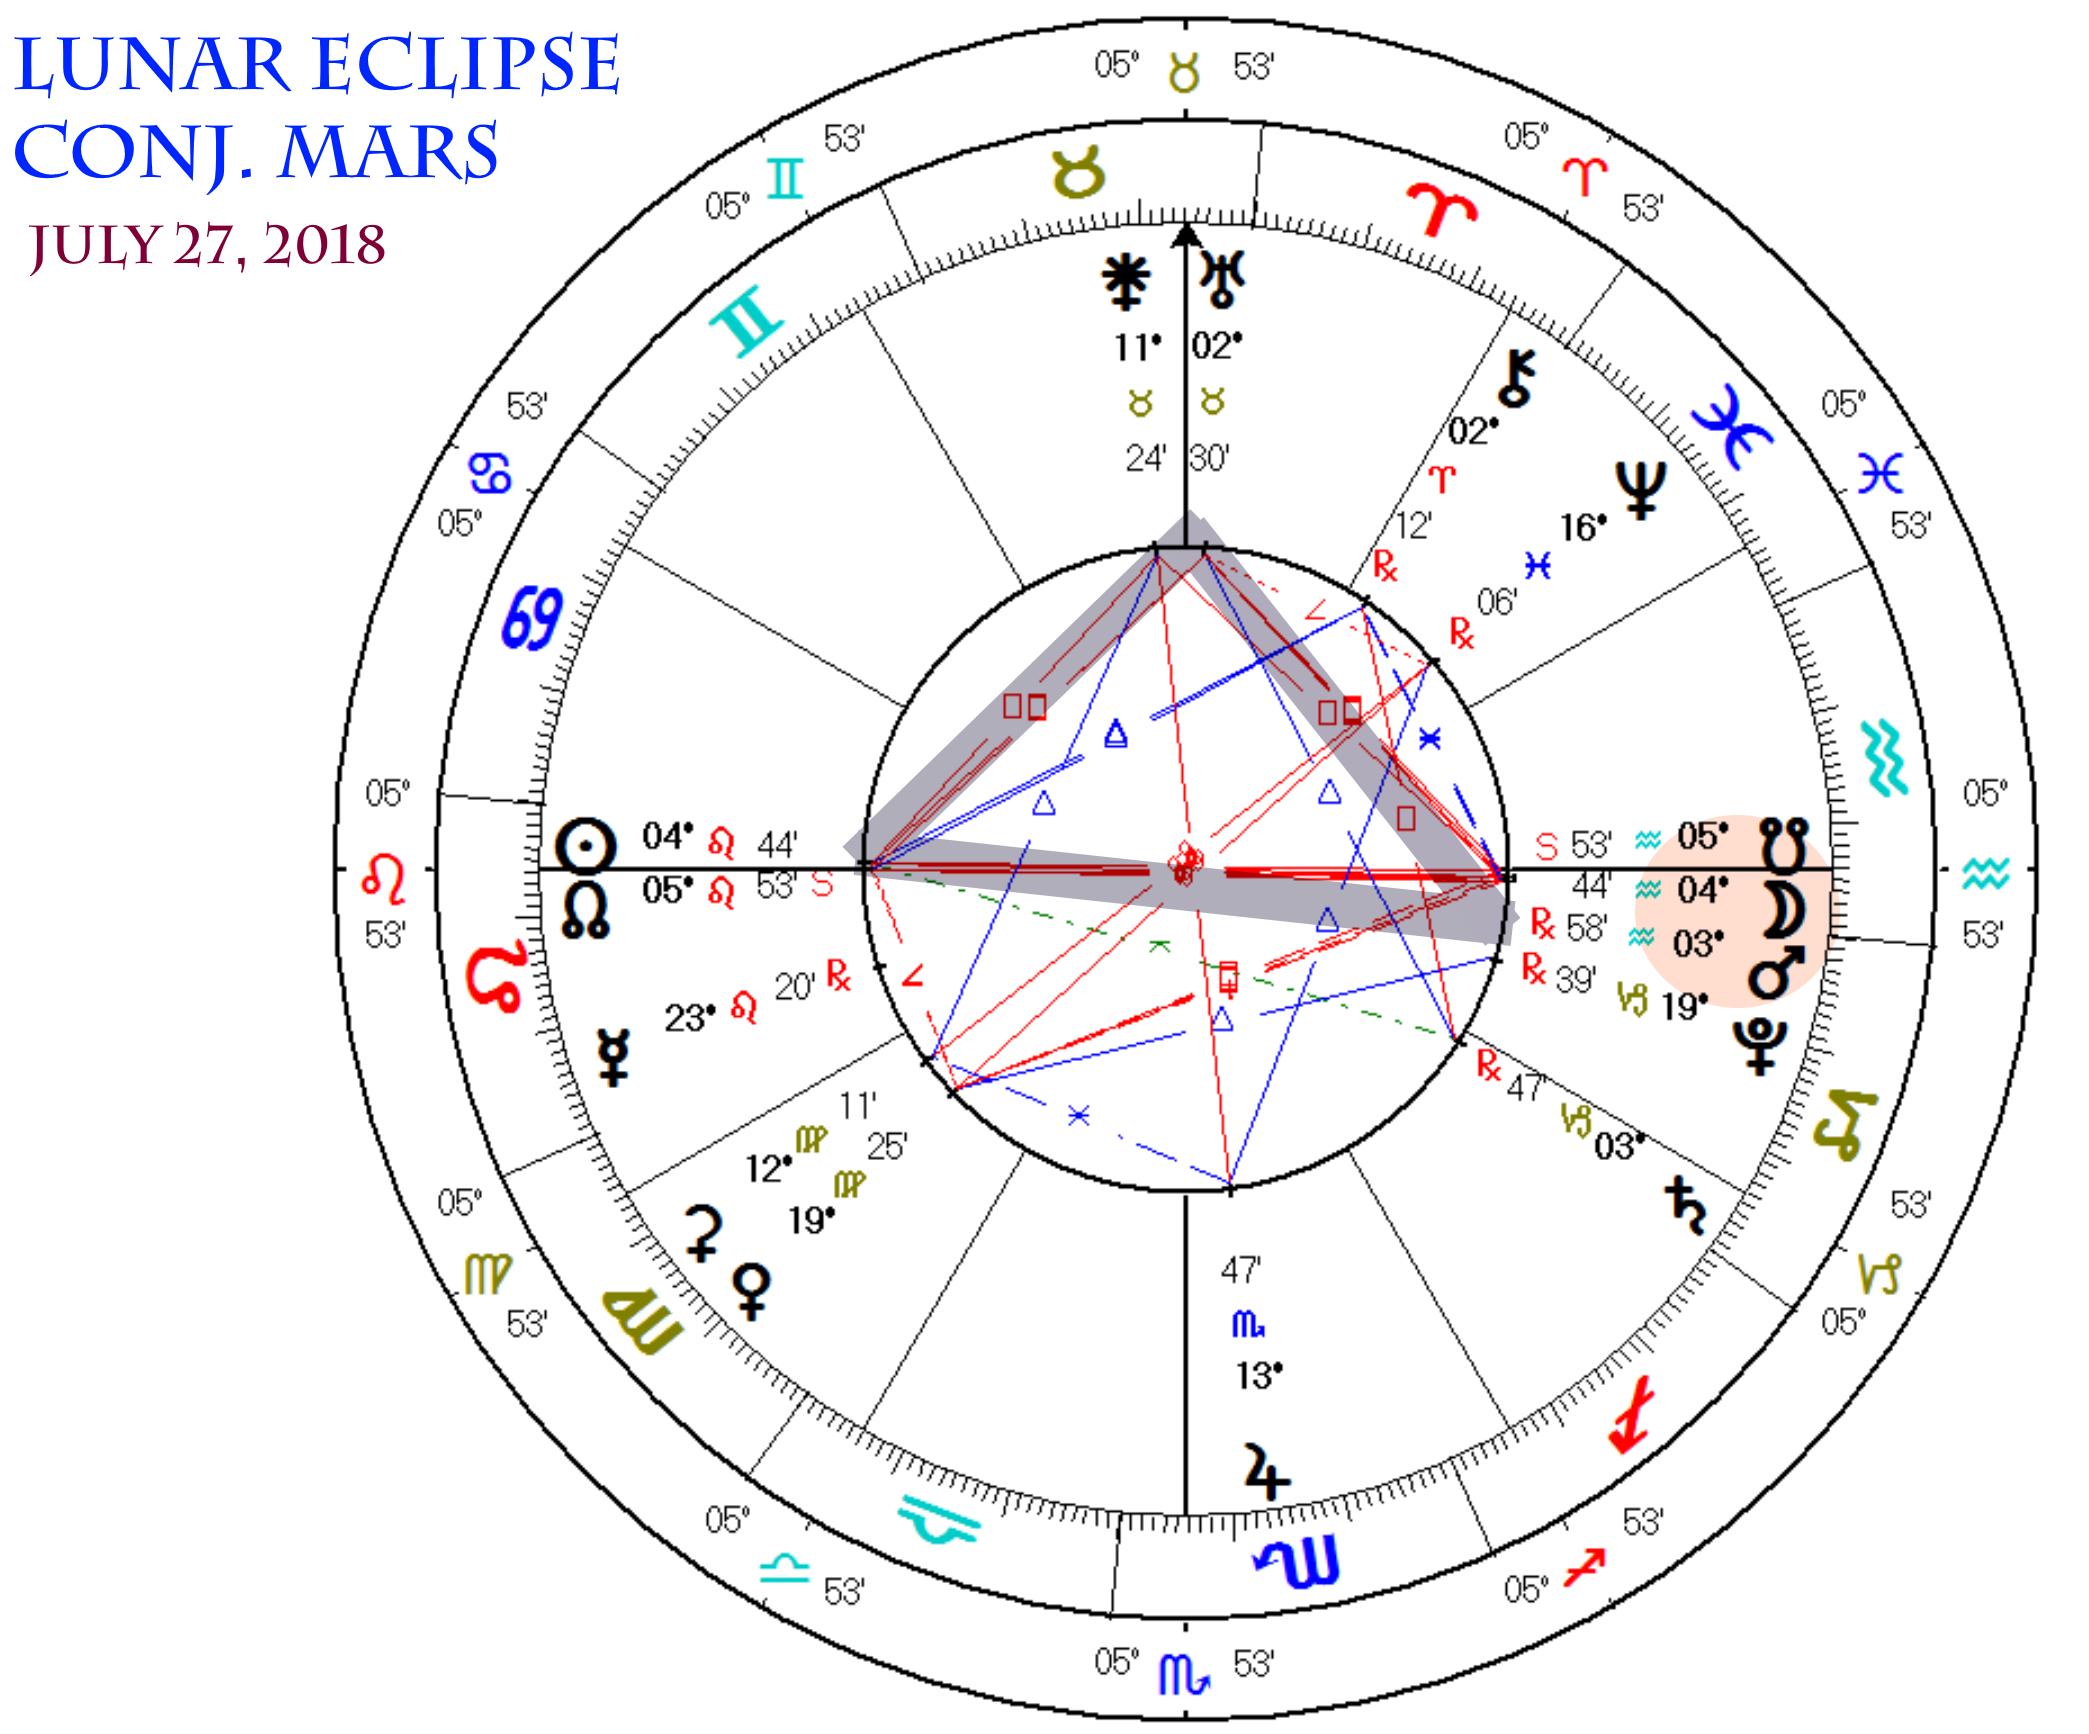 The Leo - Aquarius Nodes - Maurice Fernandez - Astrology and